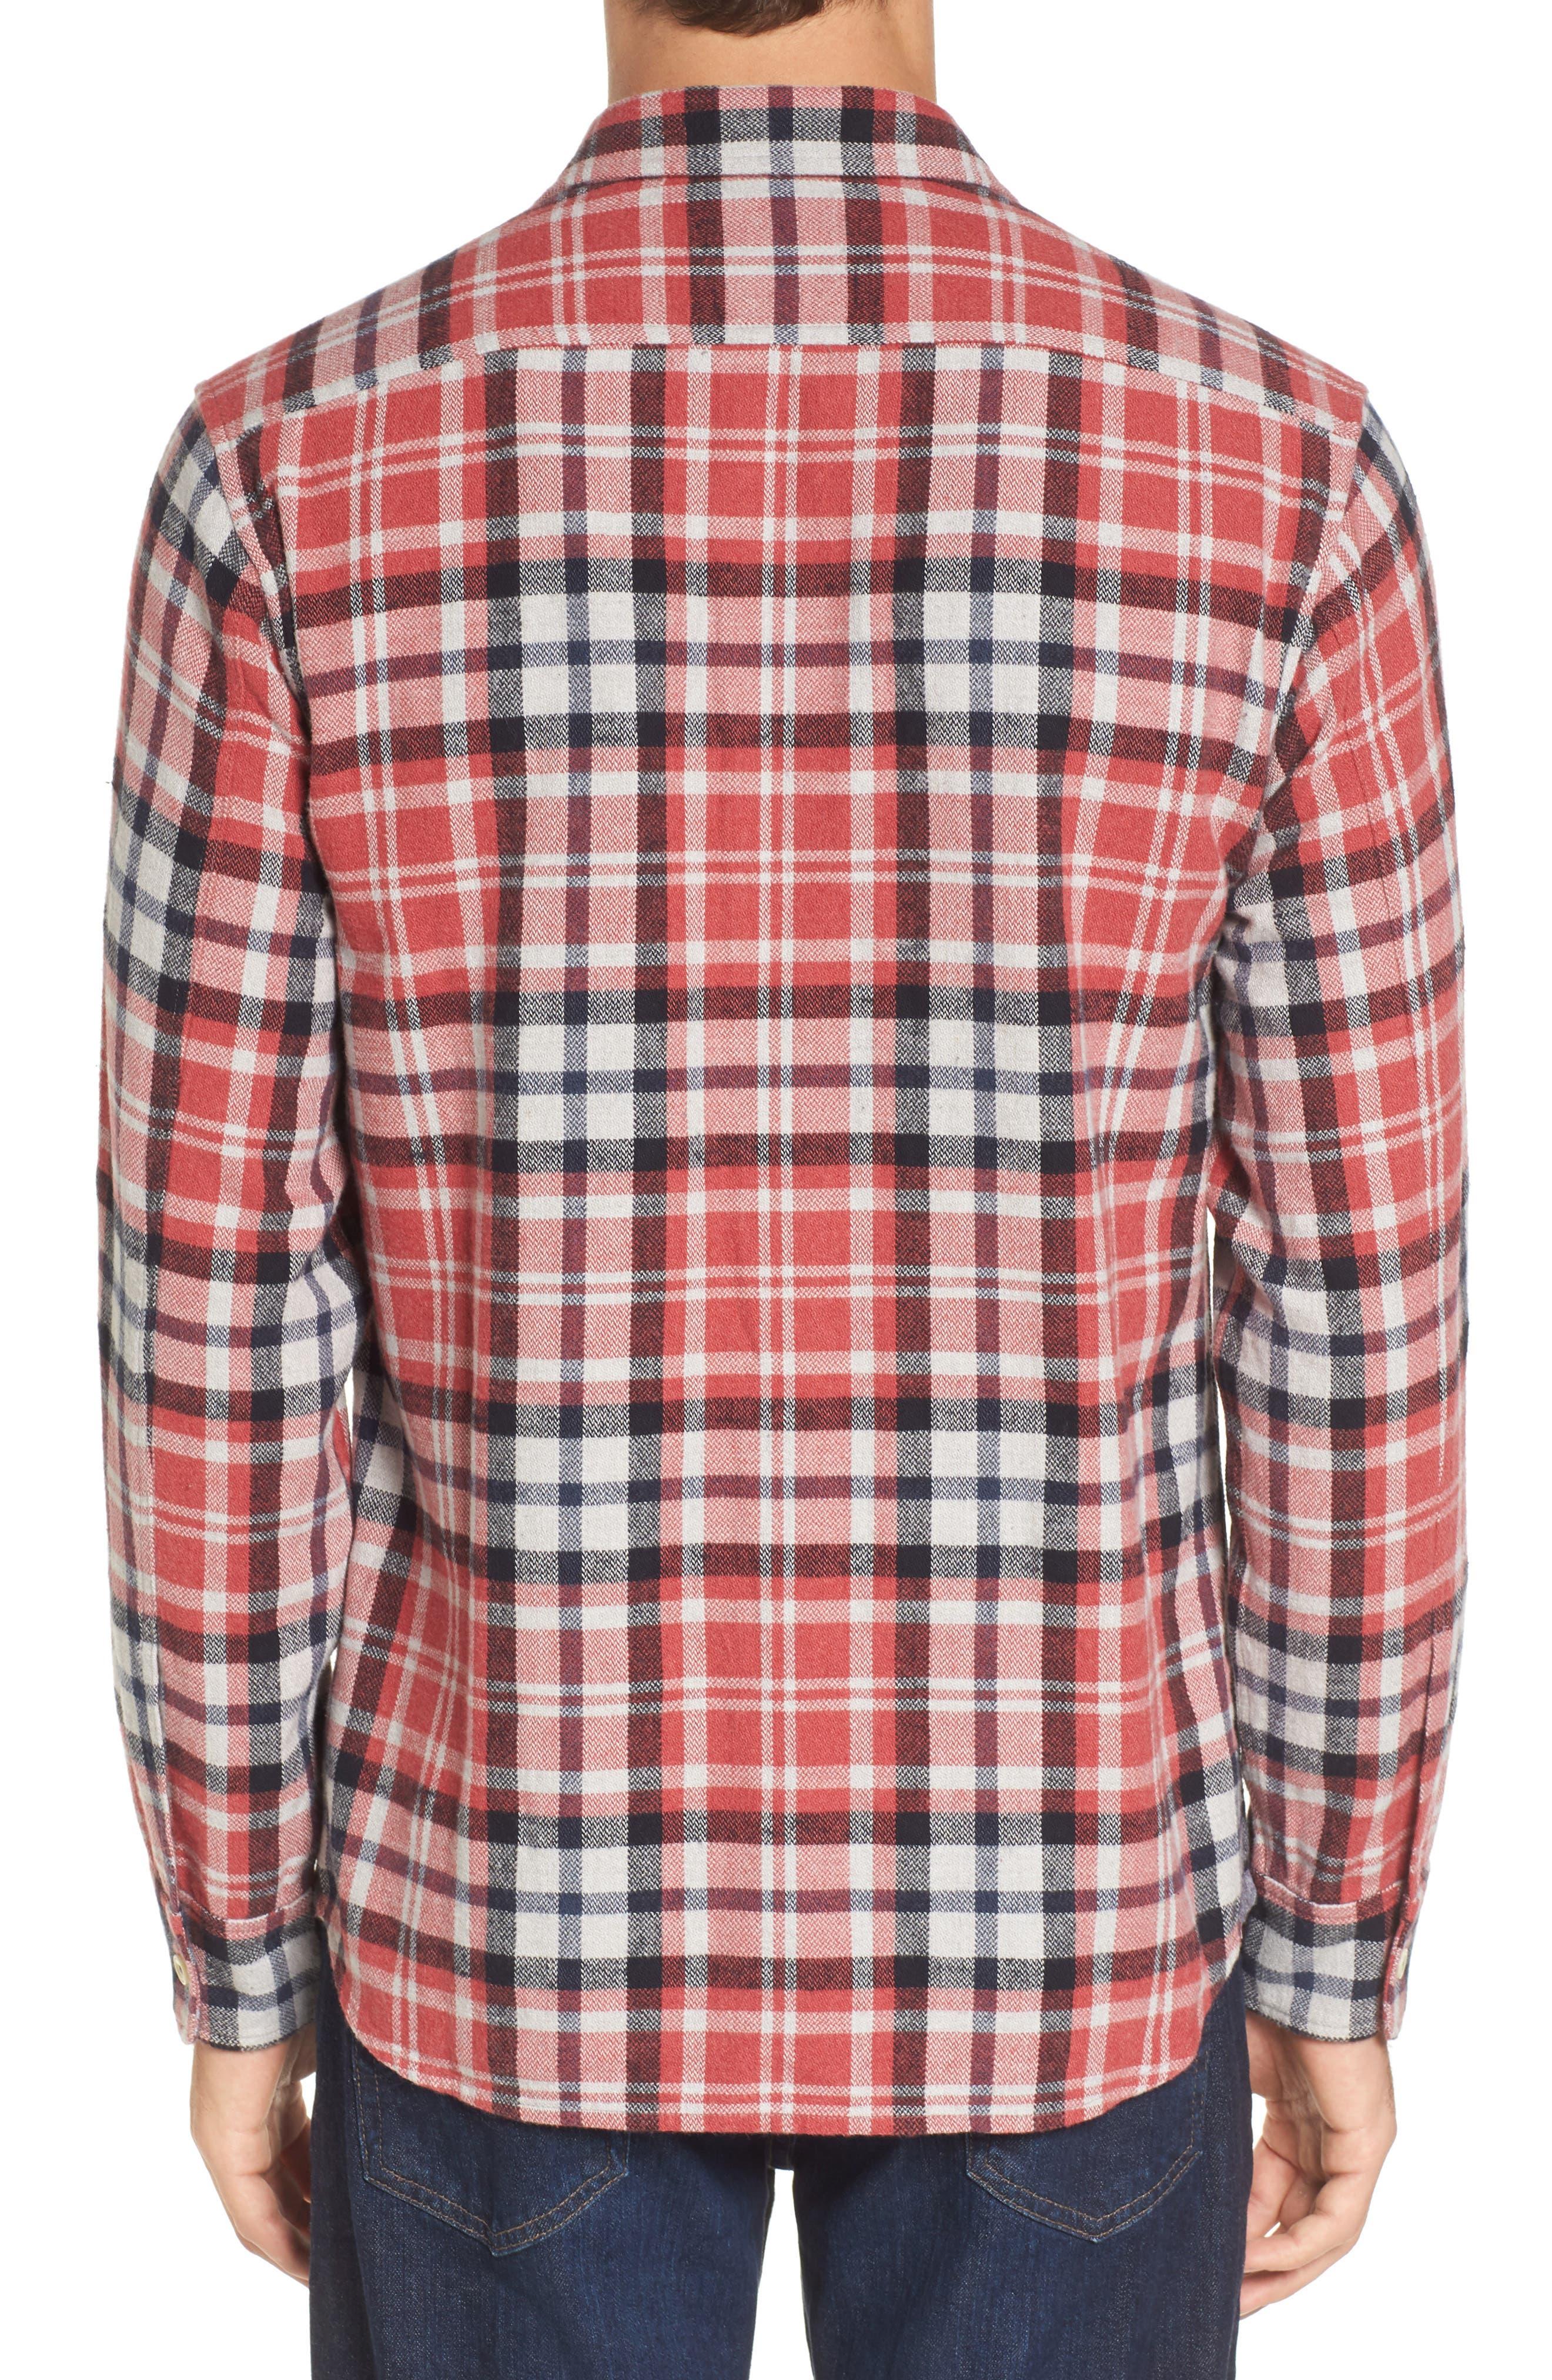 Brampton Textured Plaid Flannel Shirt,                             Alternate thumbnail 2, color,                             Red Stone Navy